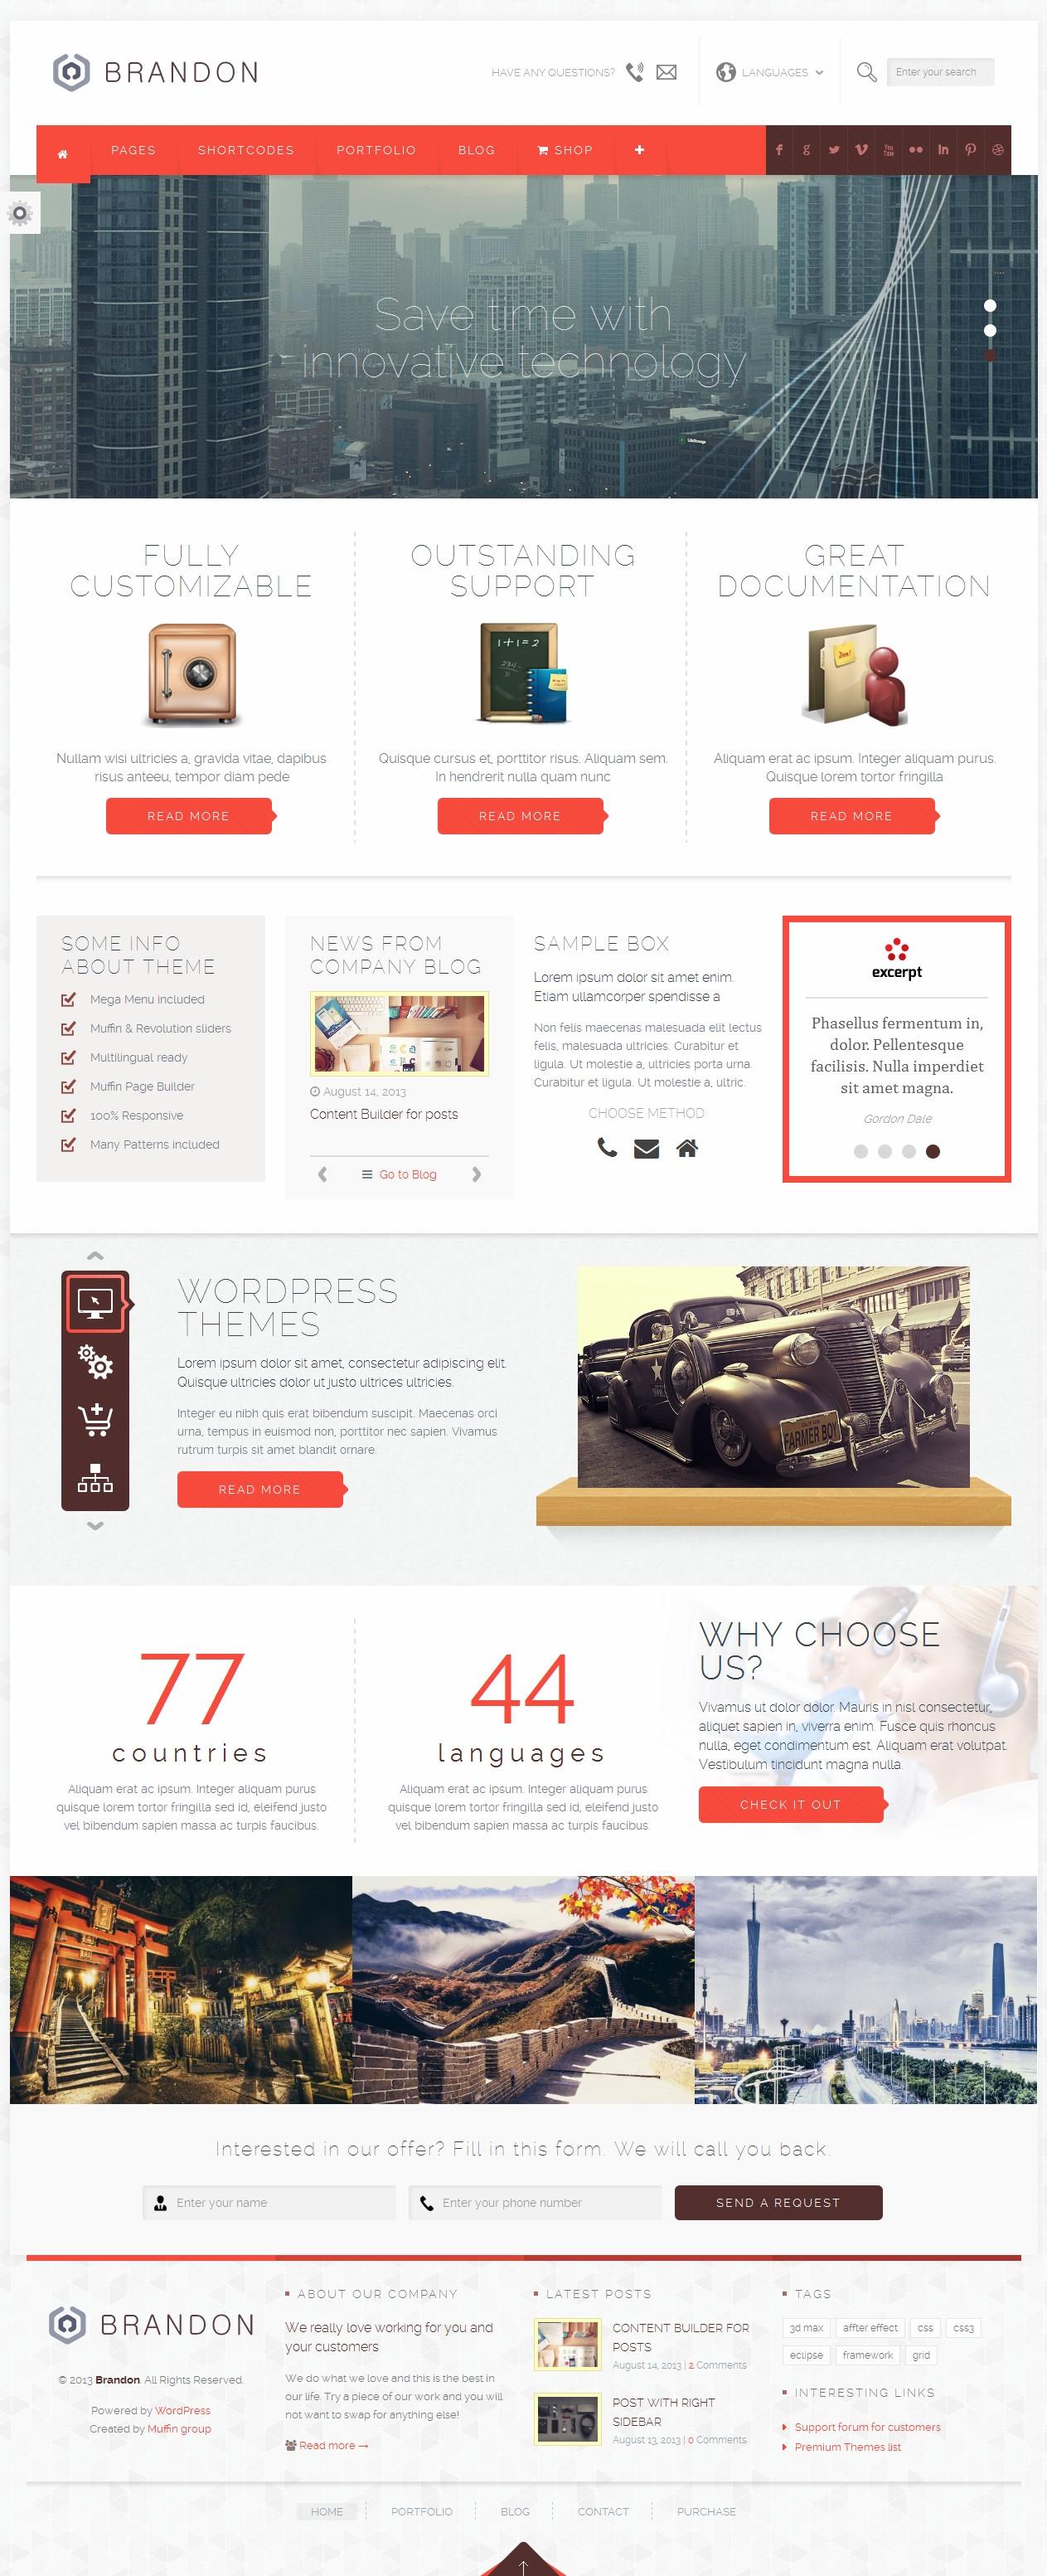 brandon-wordpress-responsive-theme-12